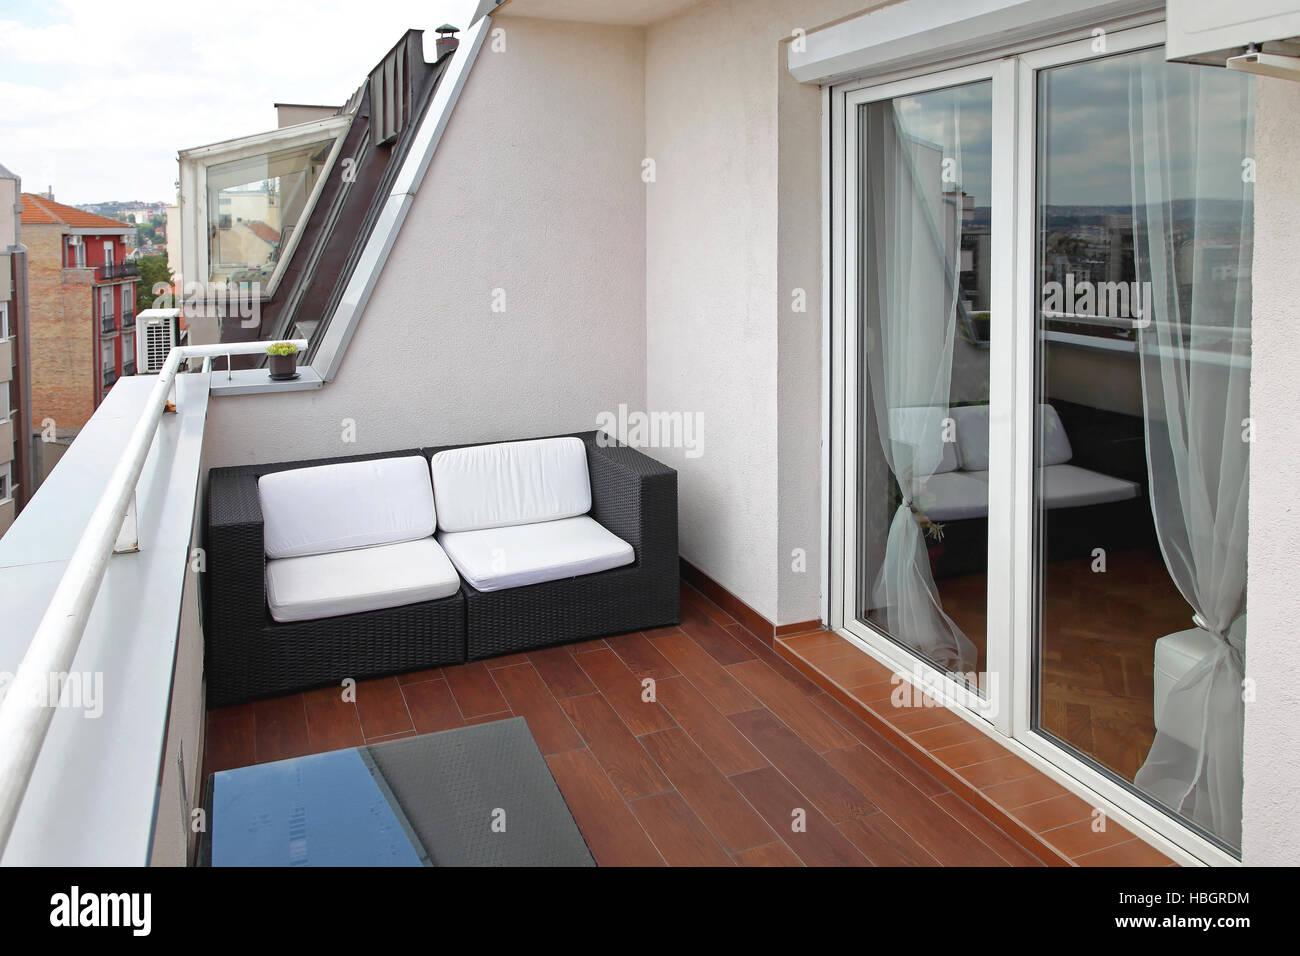 Terrace - Stock Image